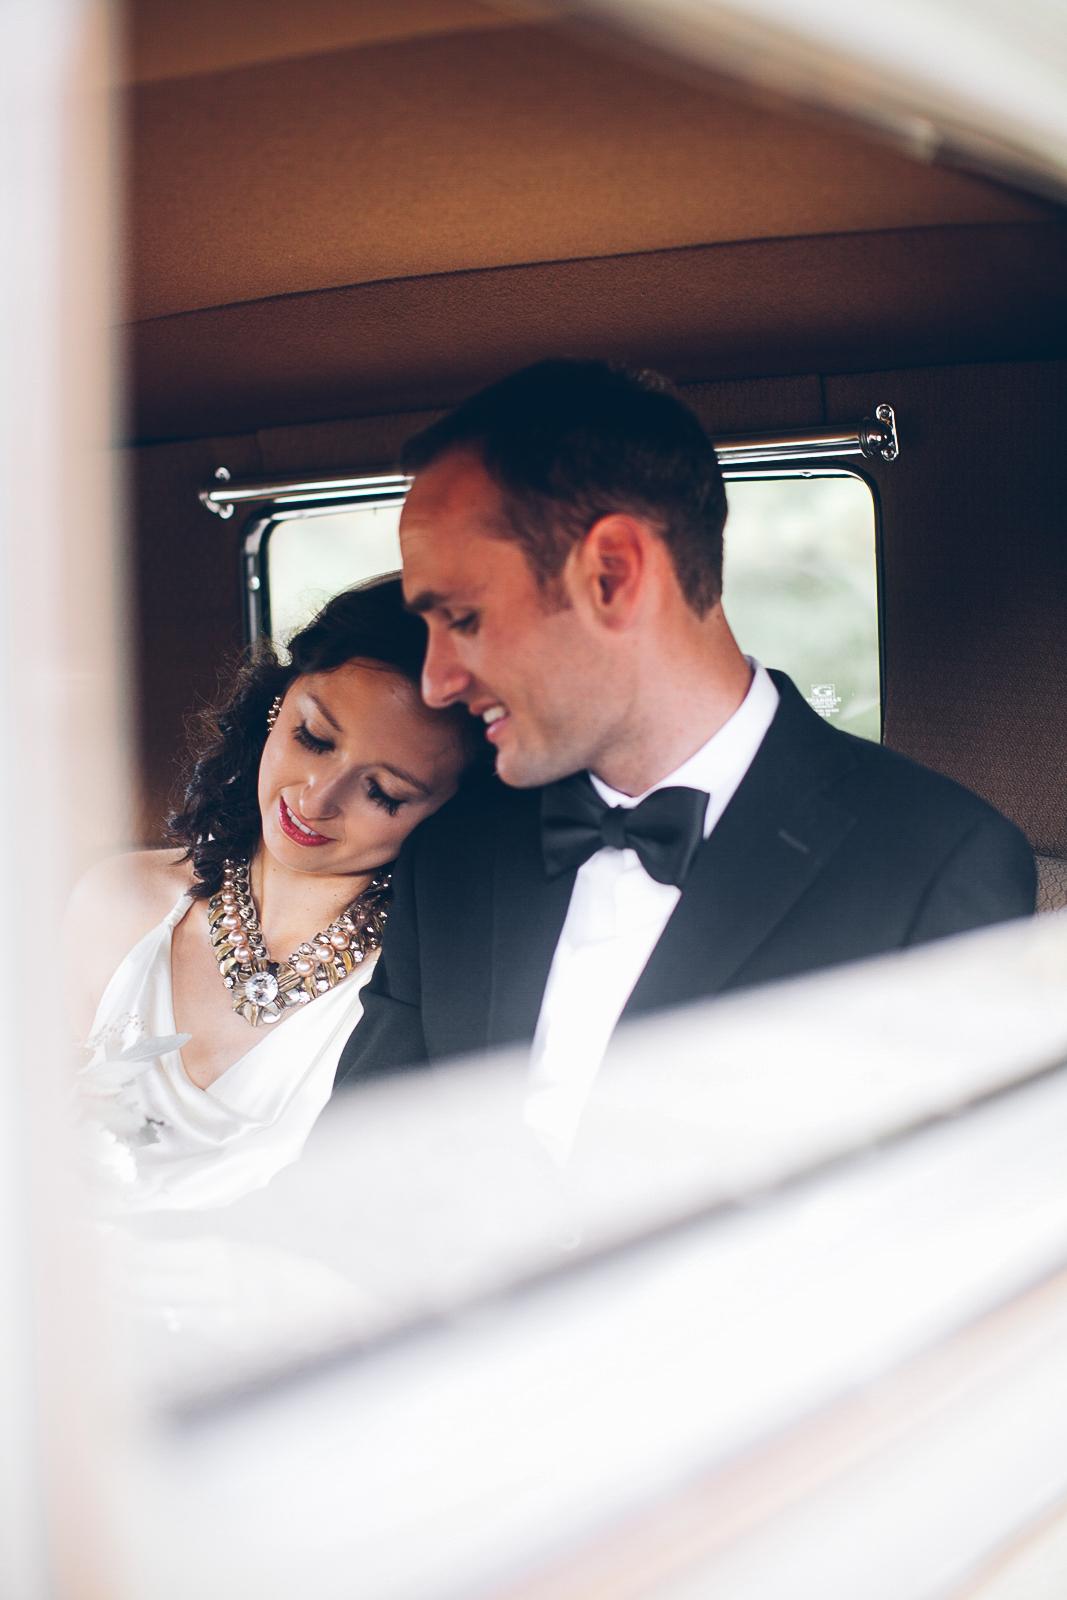 miraflores_winery_wedding_photography_ian_melissa_ebony_siovhan_bokeh_photography_82.jpg